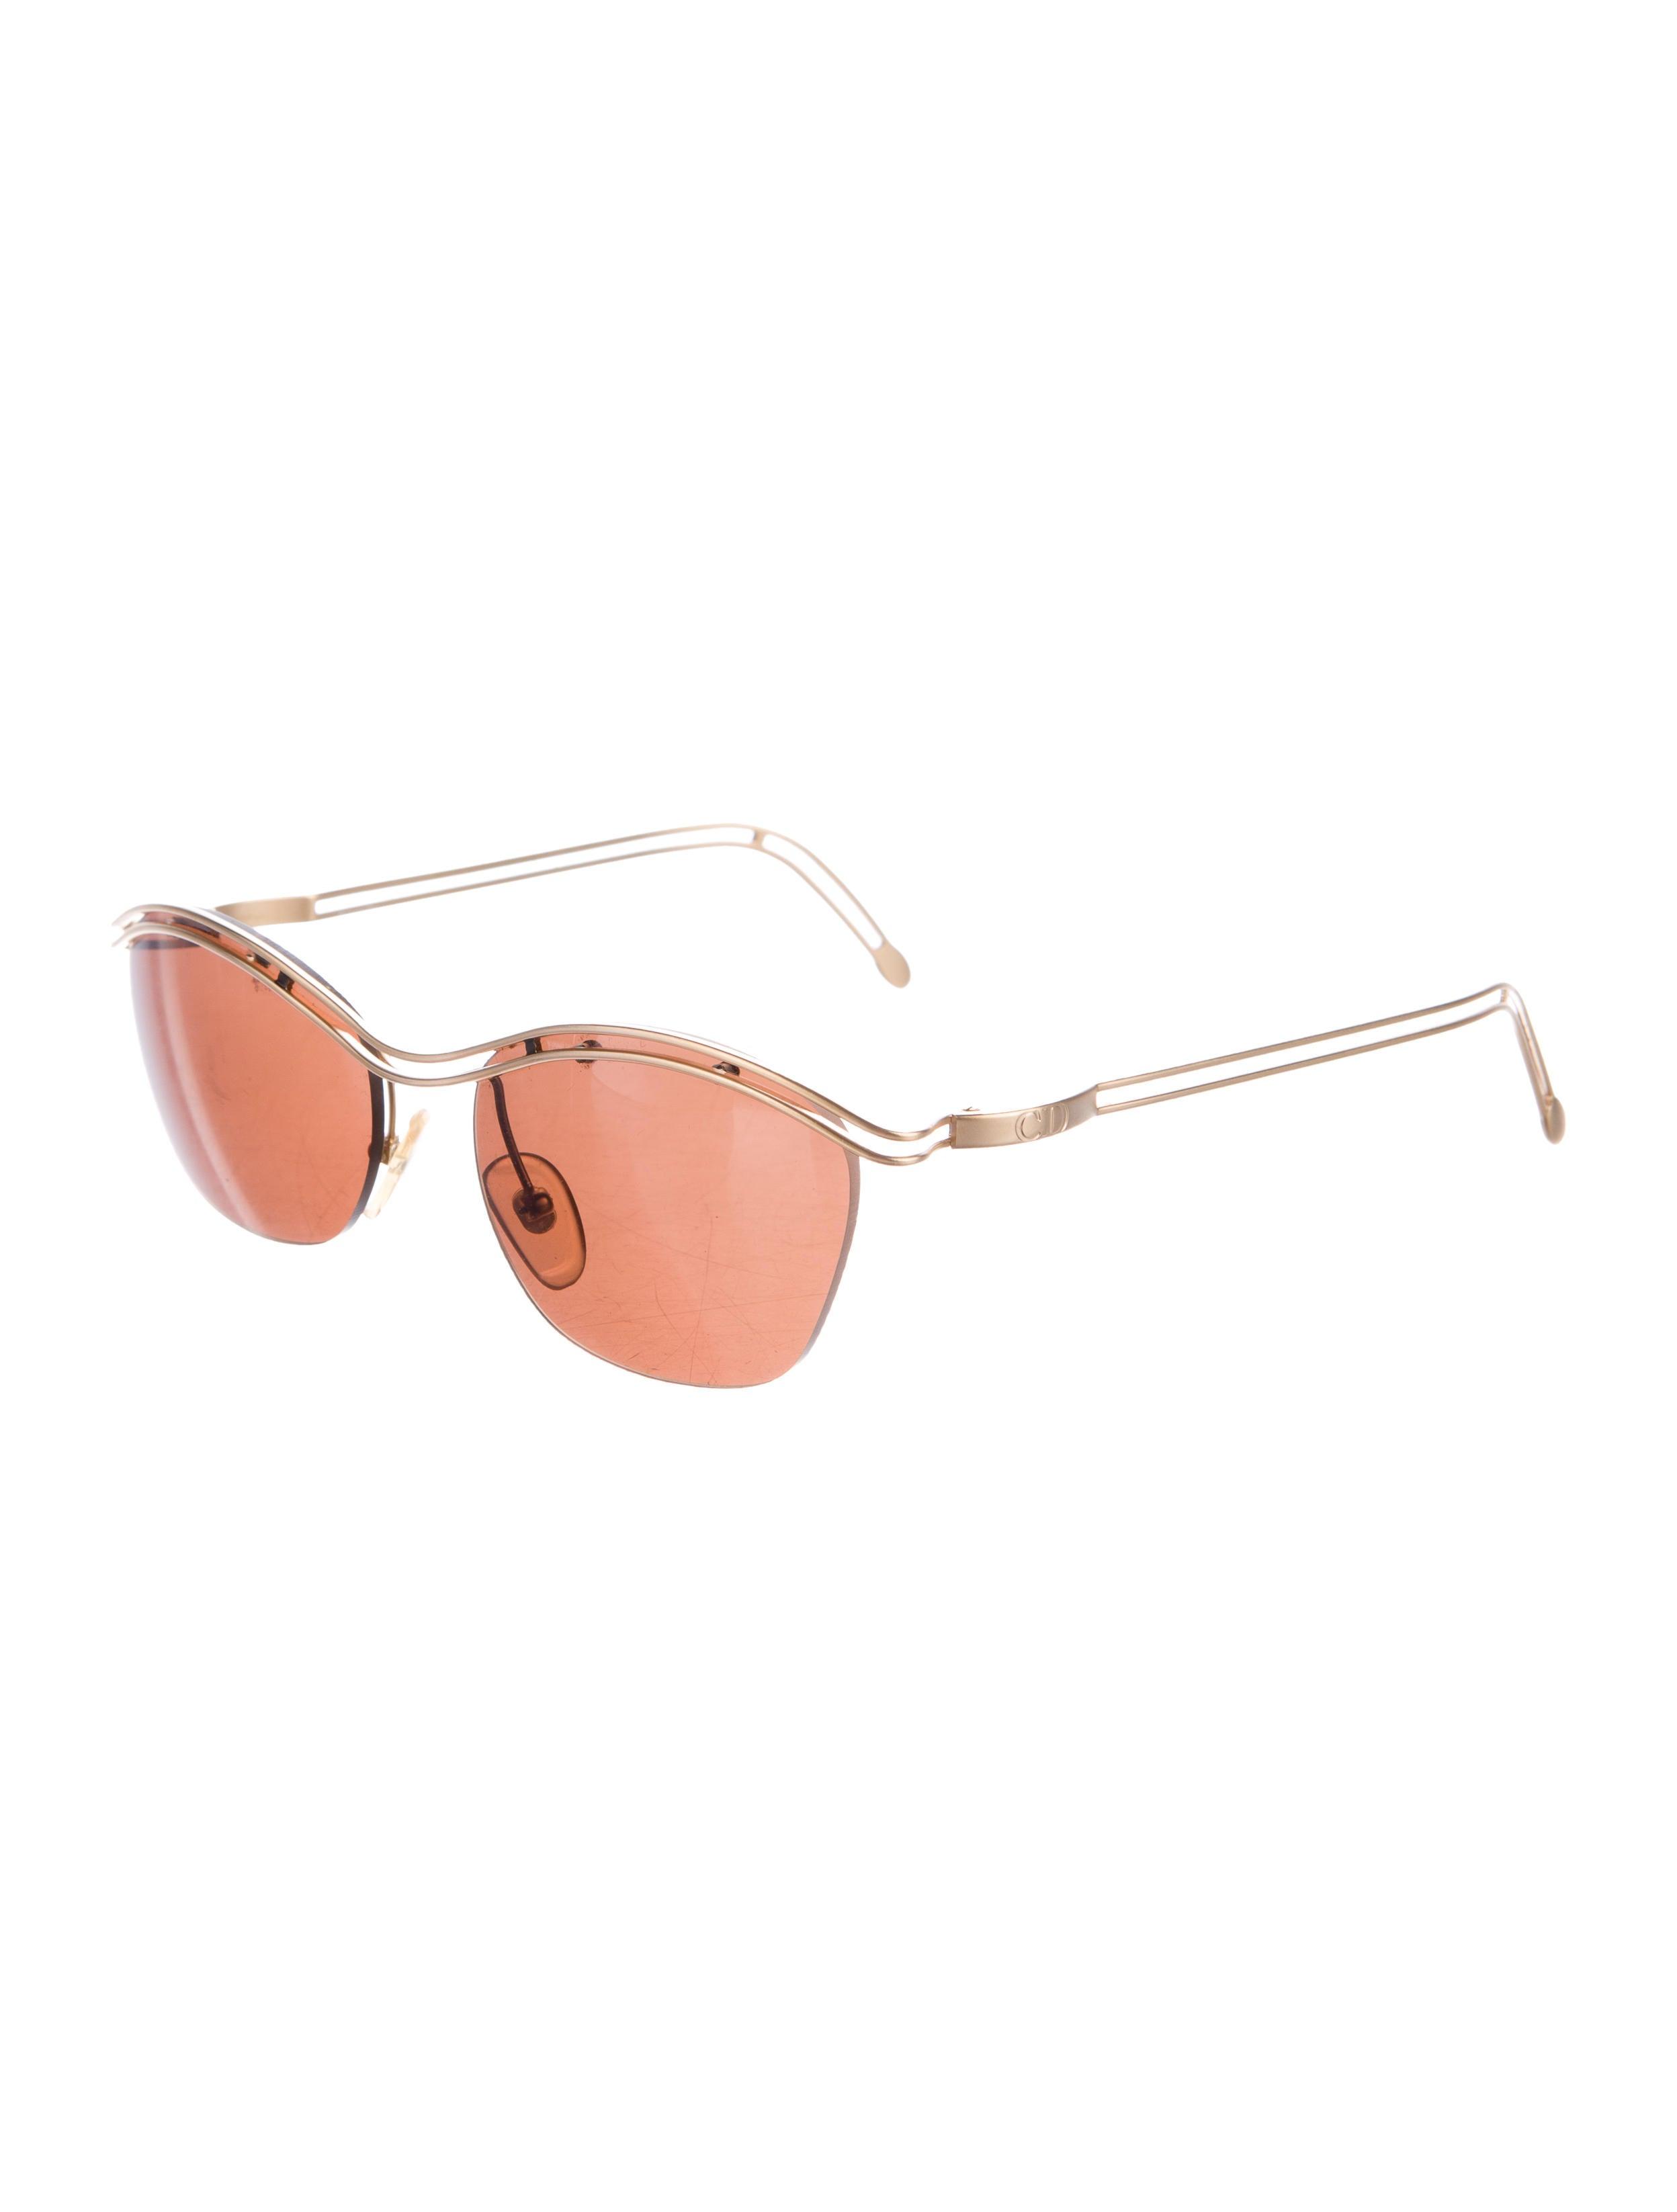 6d644ff124f5 Christian Dior Rimless Eyeglasses